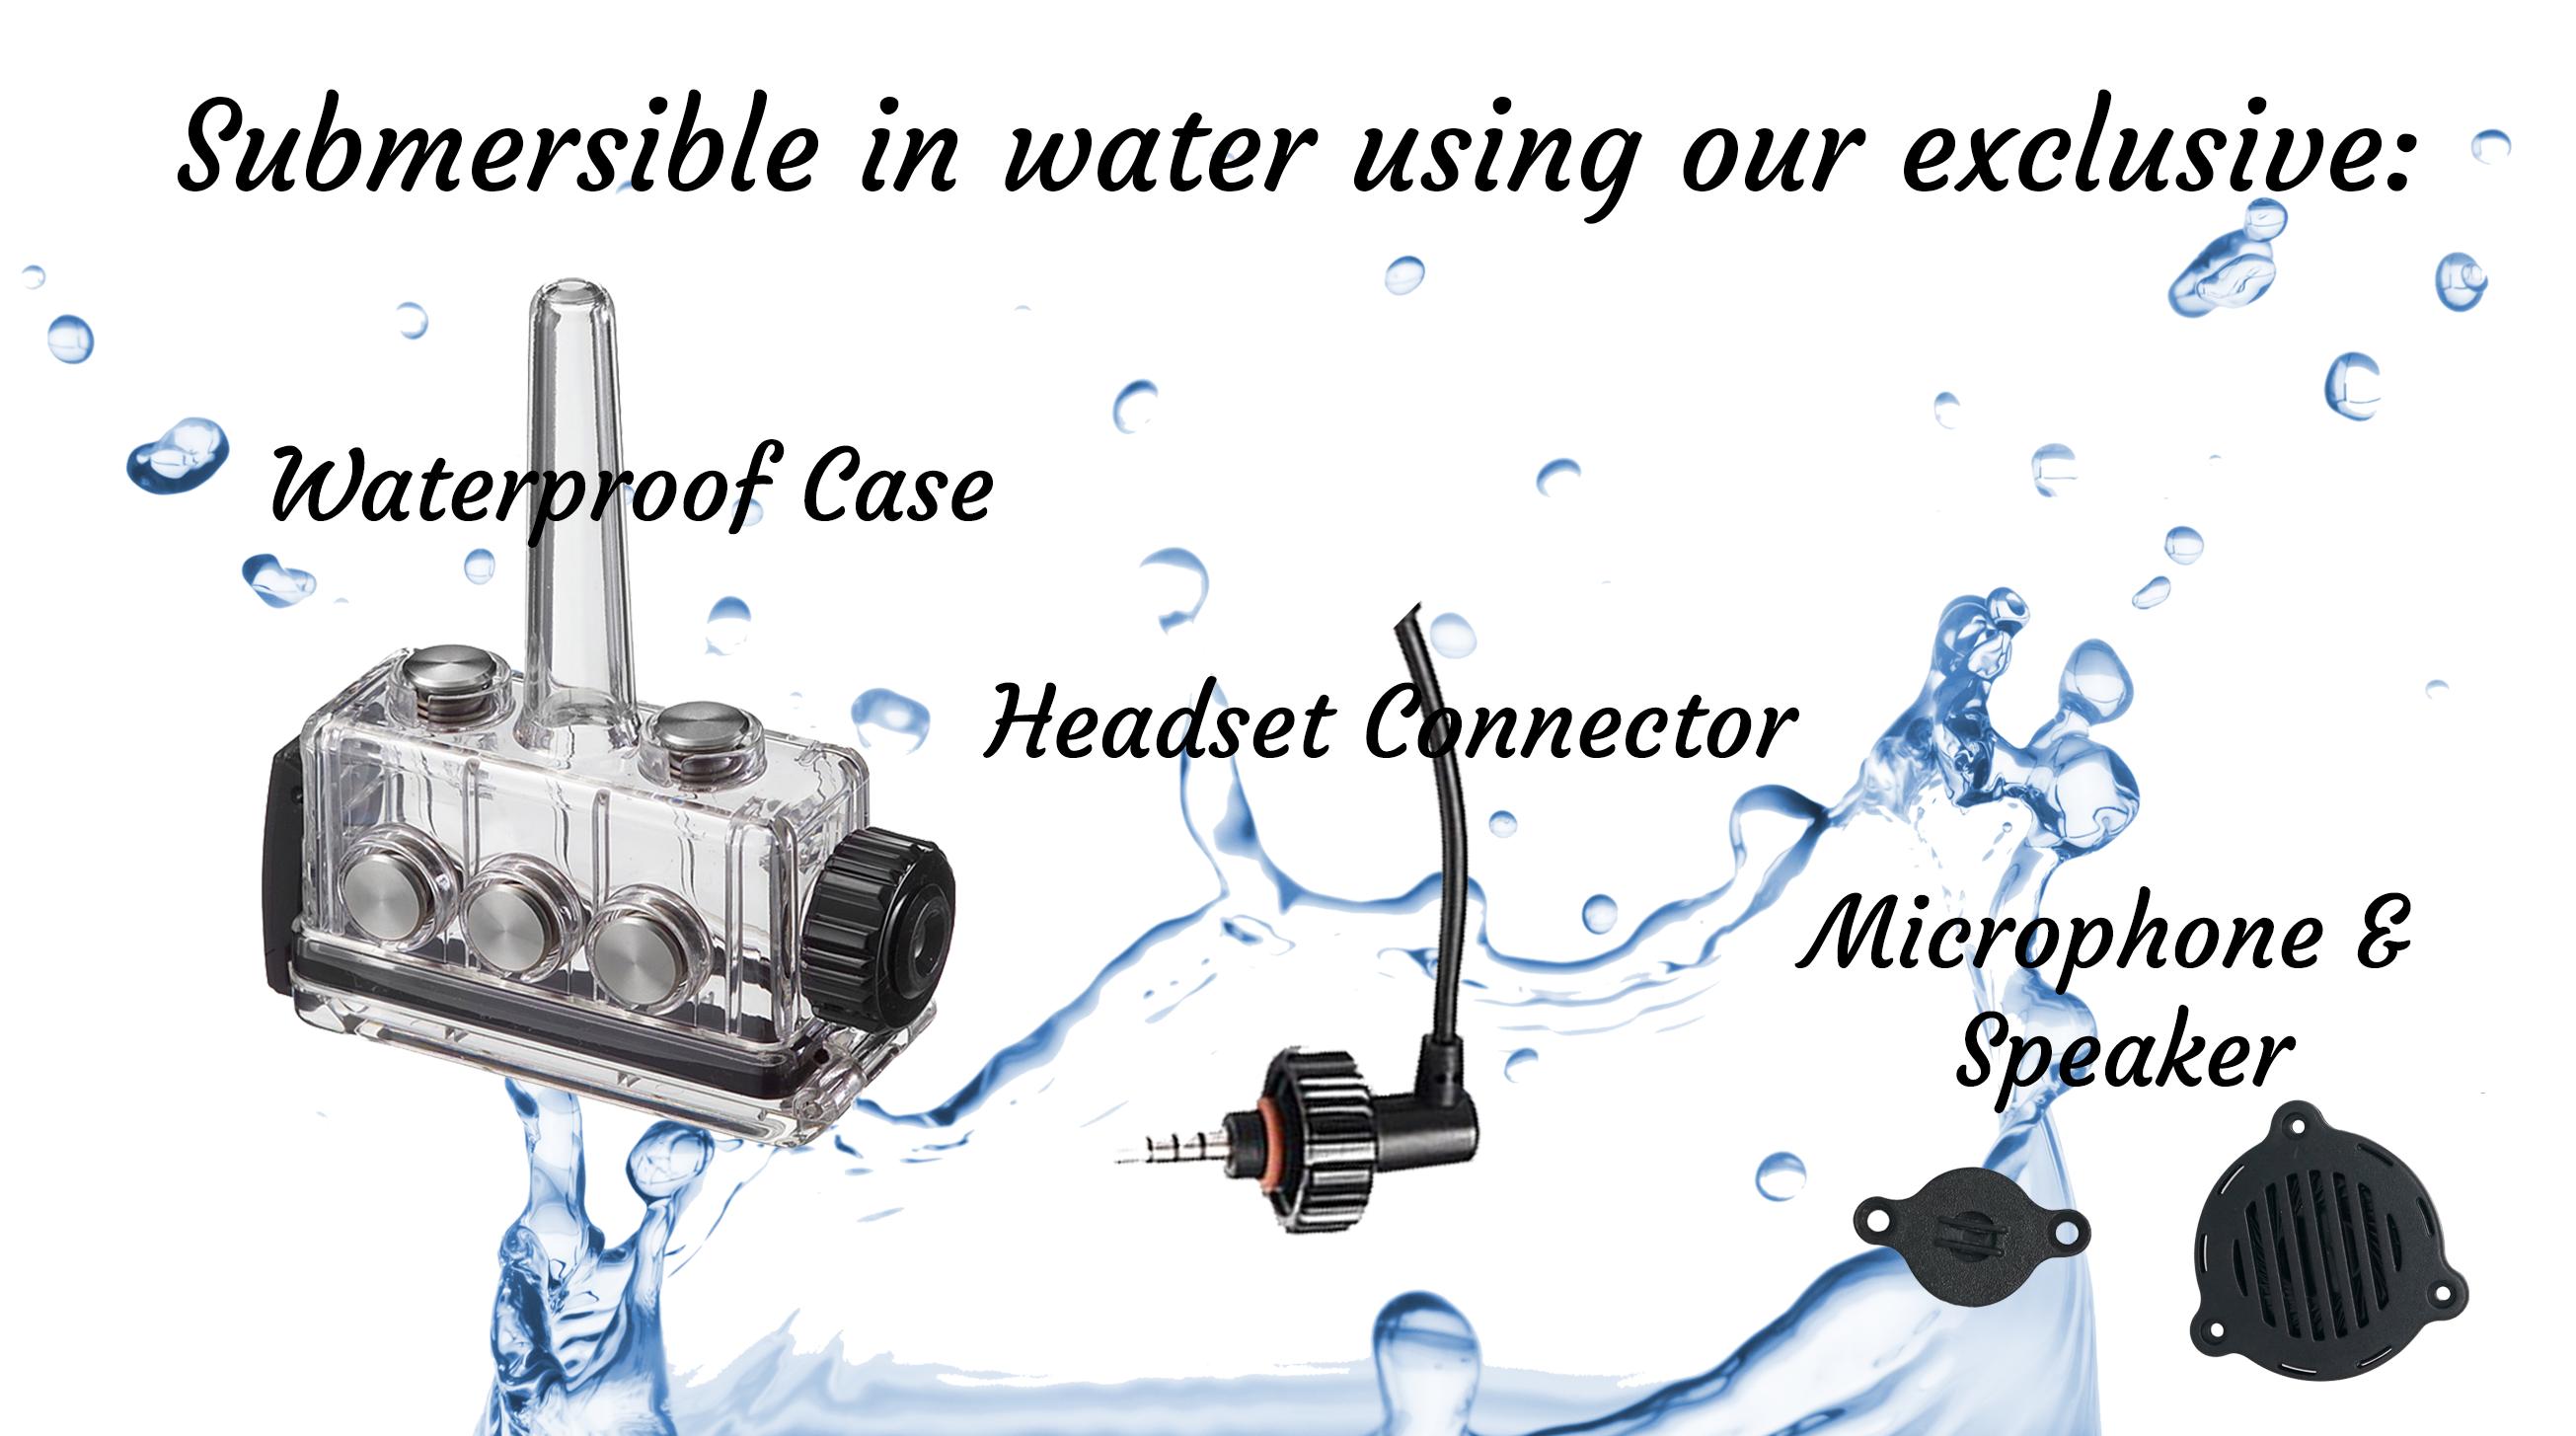 What makes BbTALKIN products waterproof